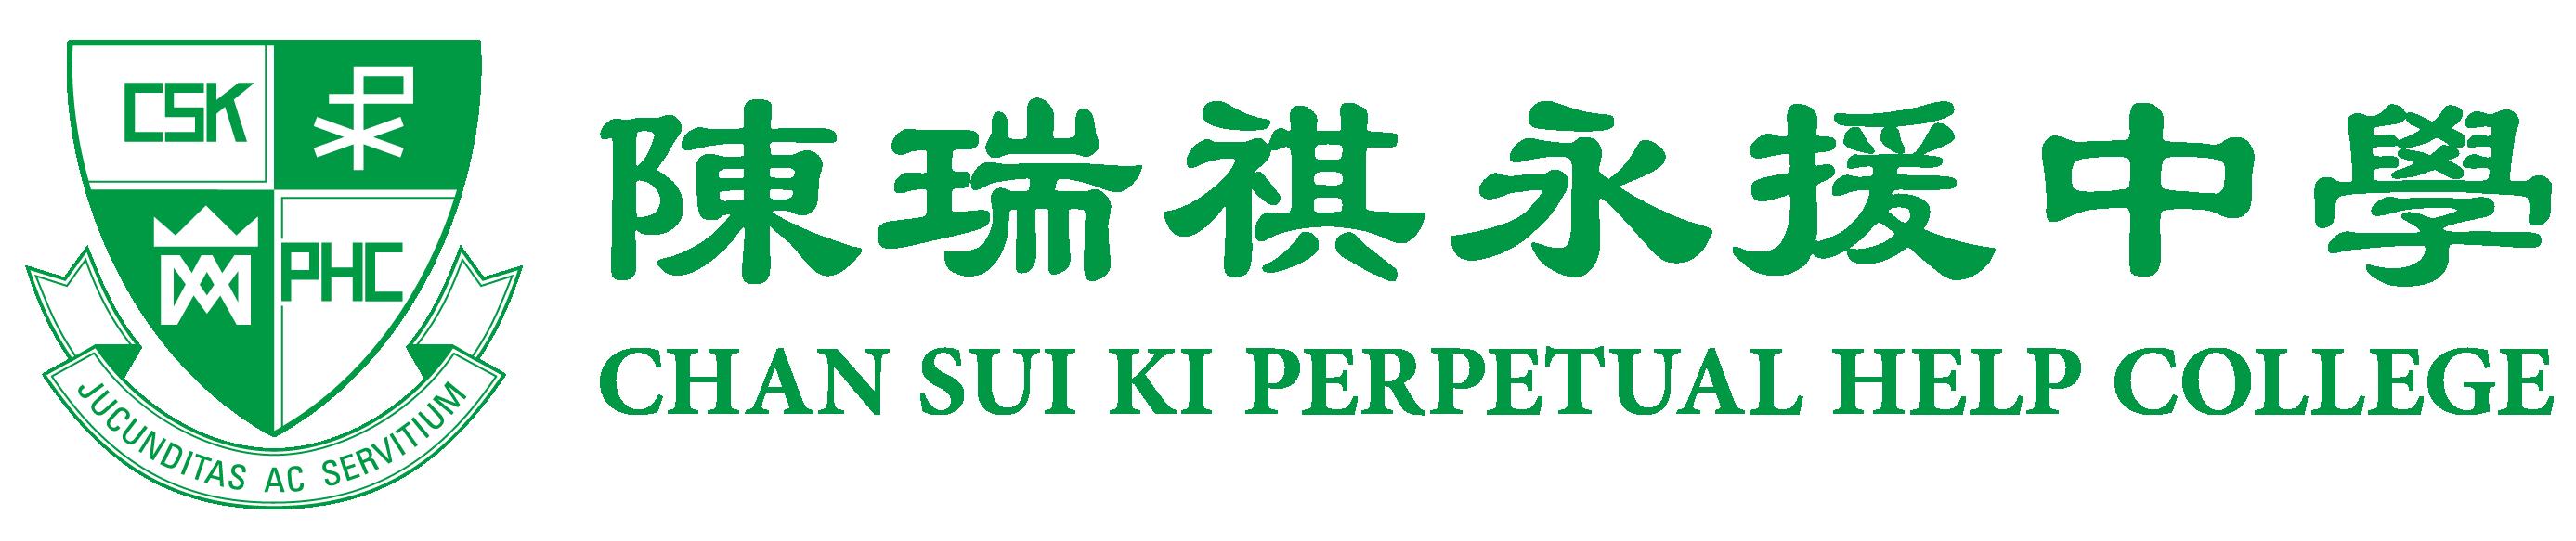 Chan Sui Ki Perpetual Help College